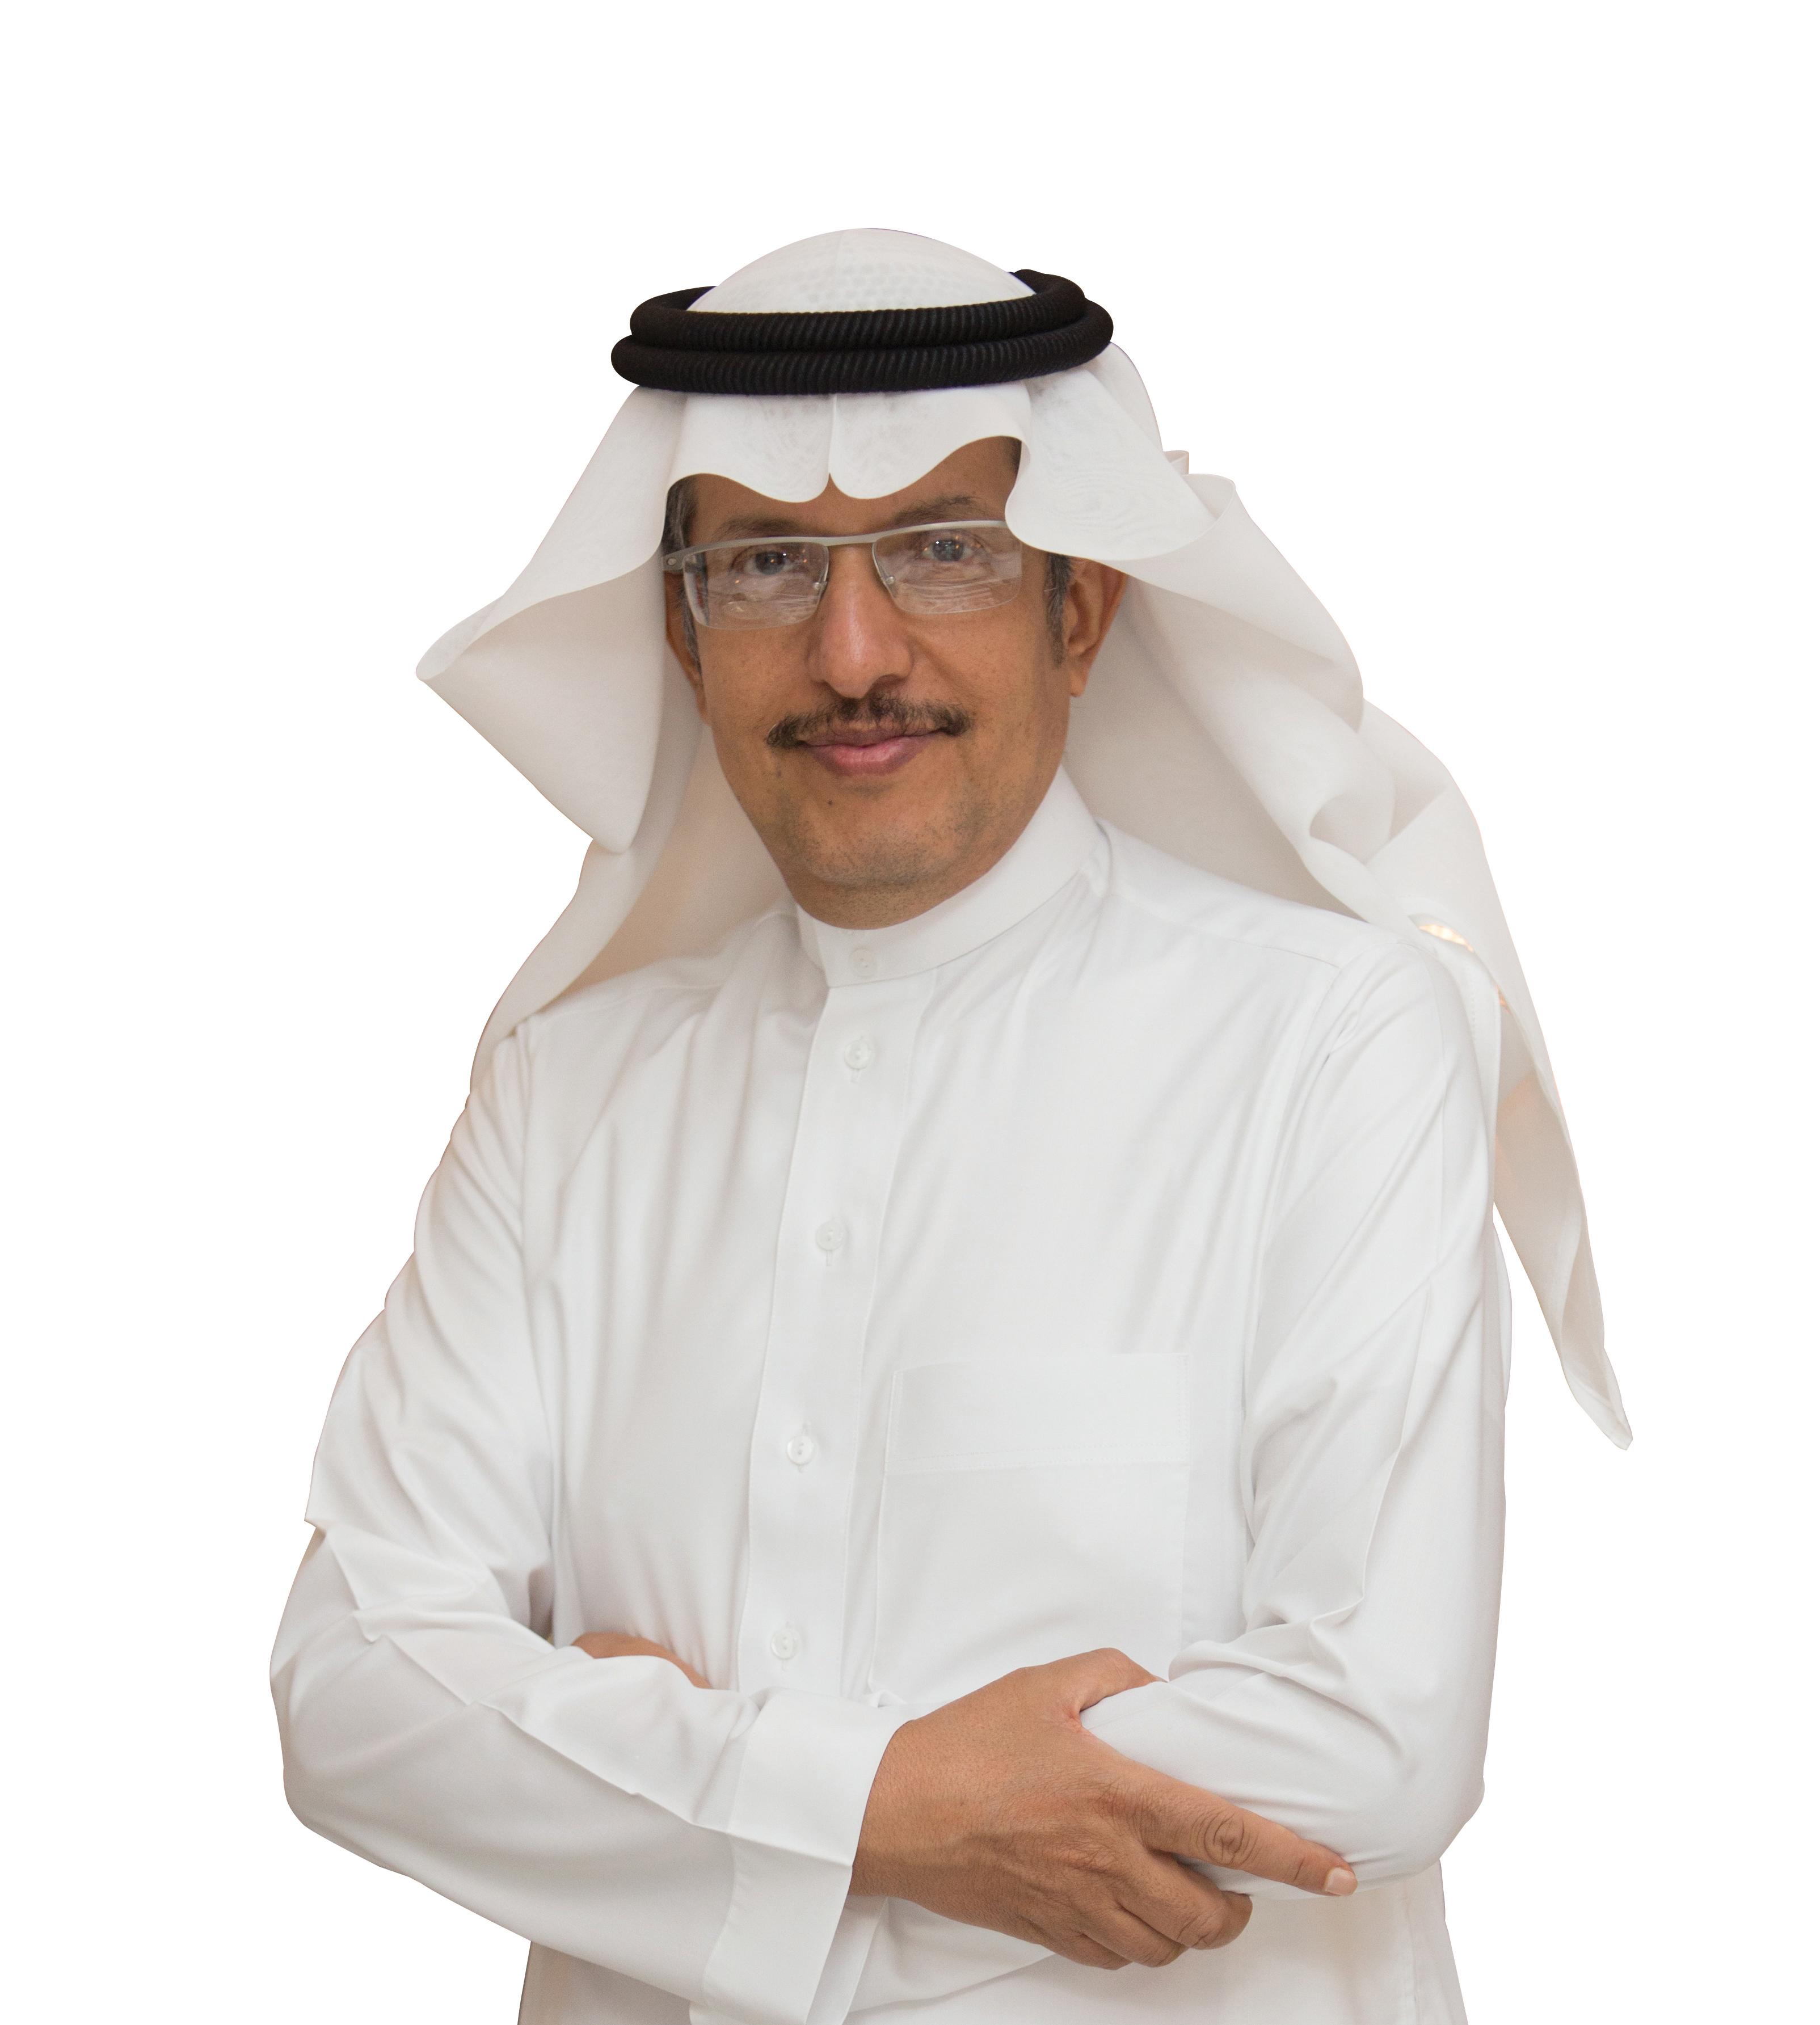 محمد ابونيان